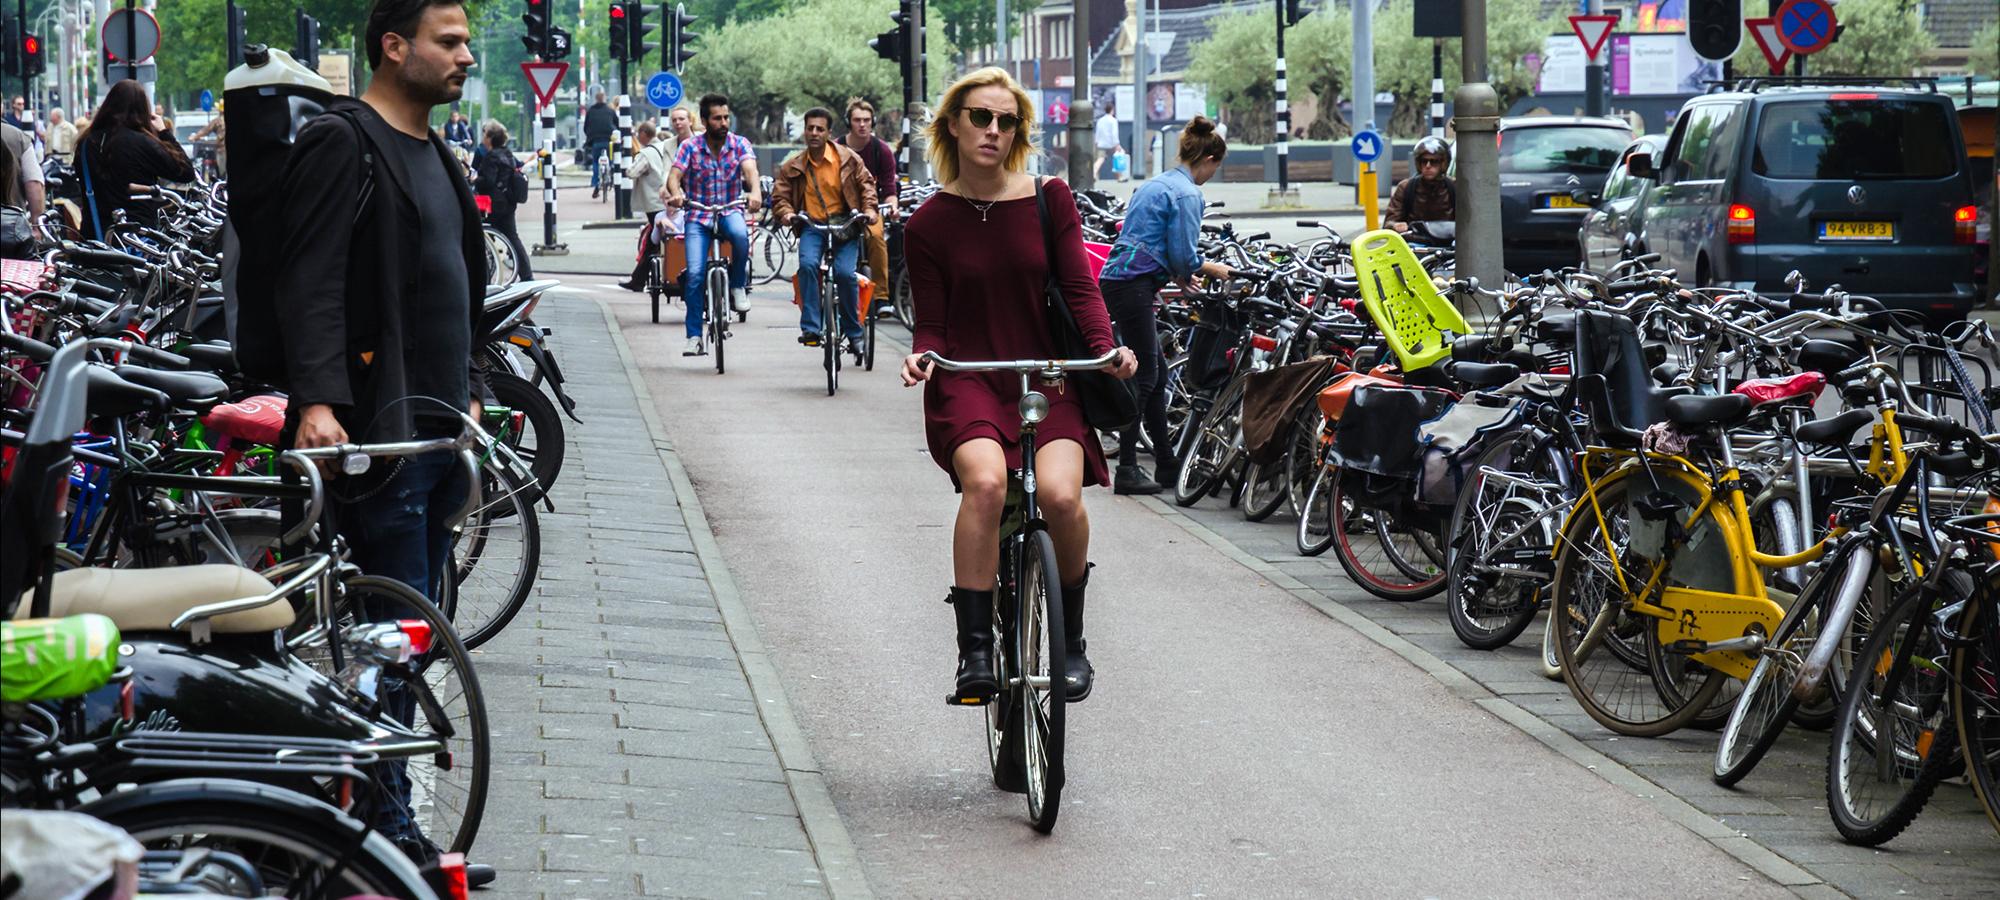 Cycling_Amsterdan_Alfredo_Borba.jpg